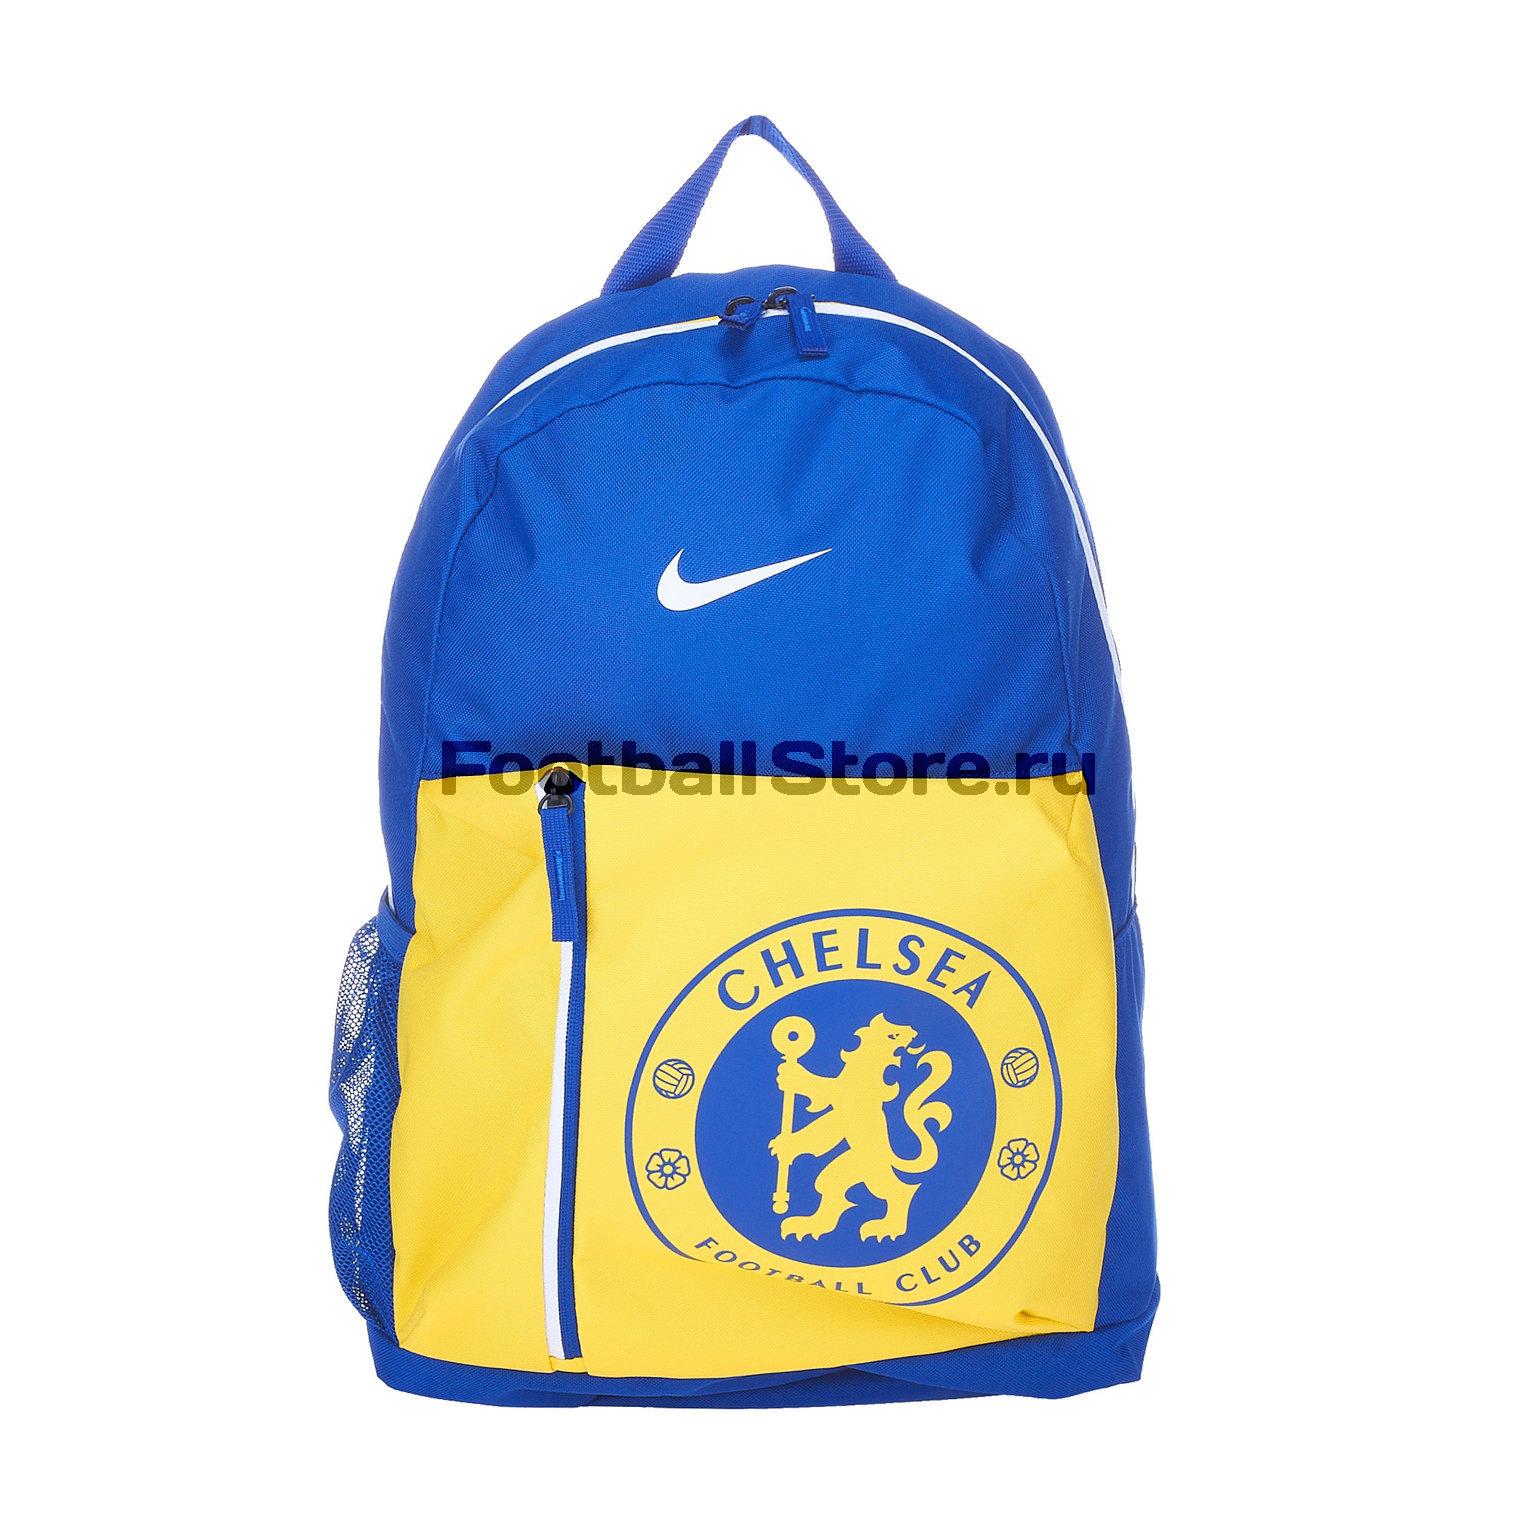 Рюкзак детский Nike Chelsea Stadium BA5525-495 цена 2017